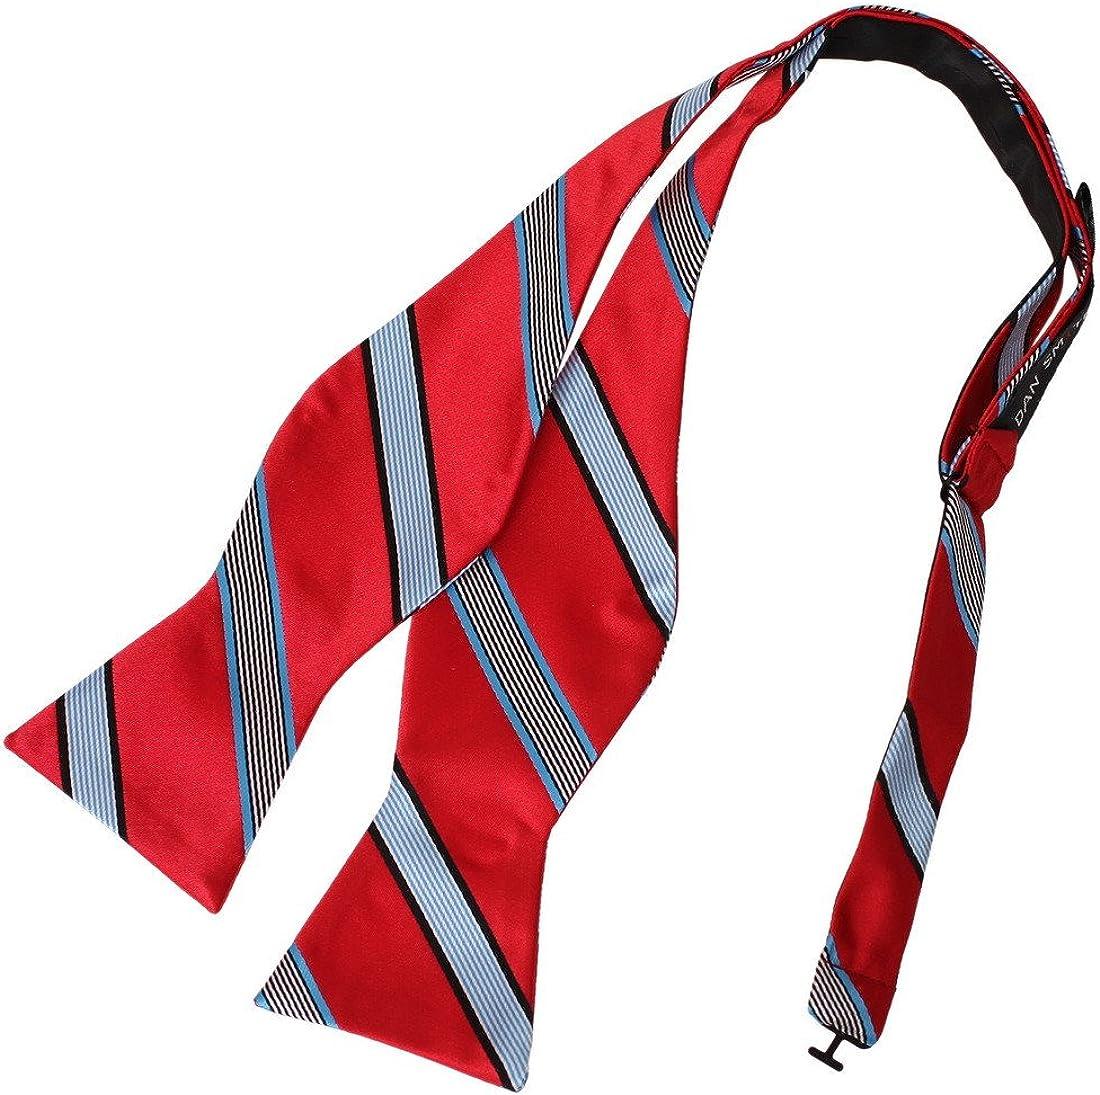 Dan Smith Men's Fashion Stripes Microfiber Self-tied Bow Tie With Box